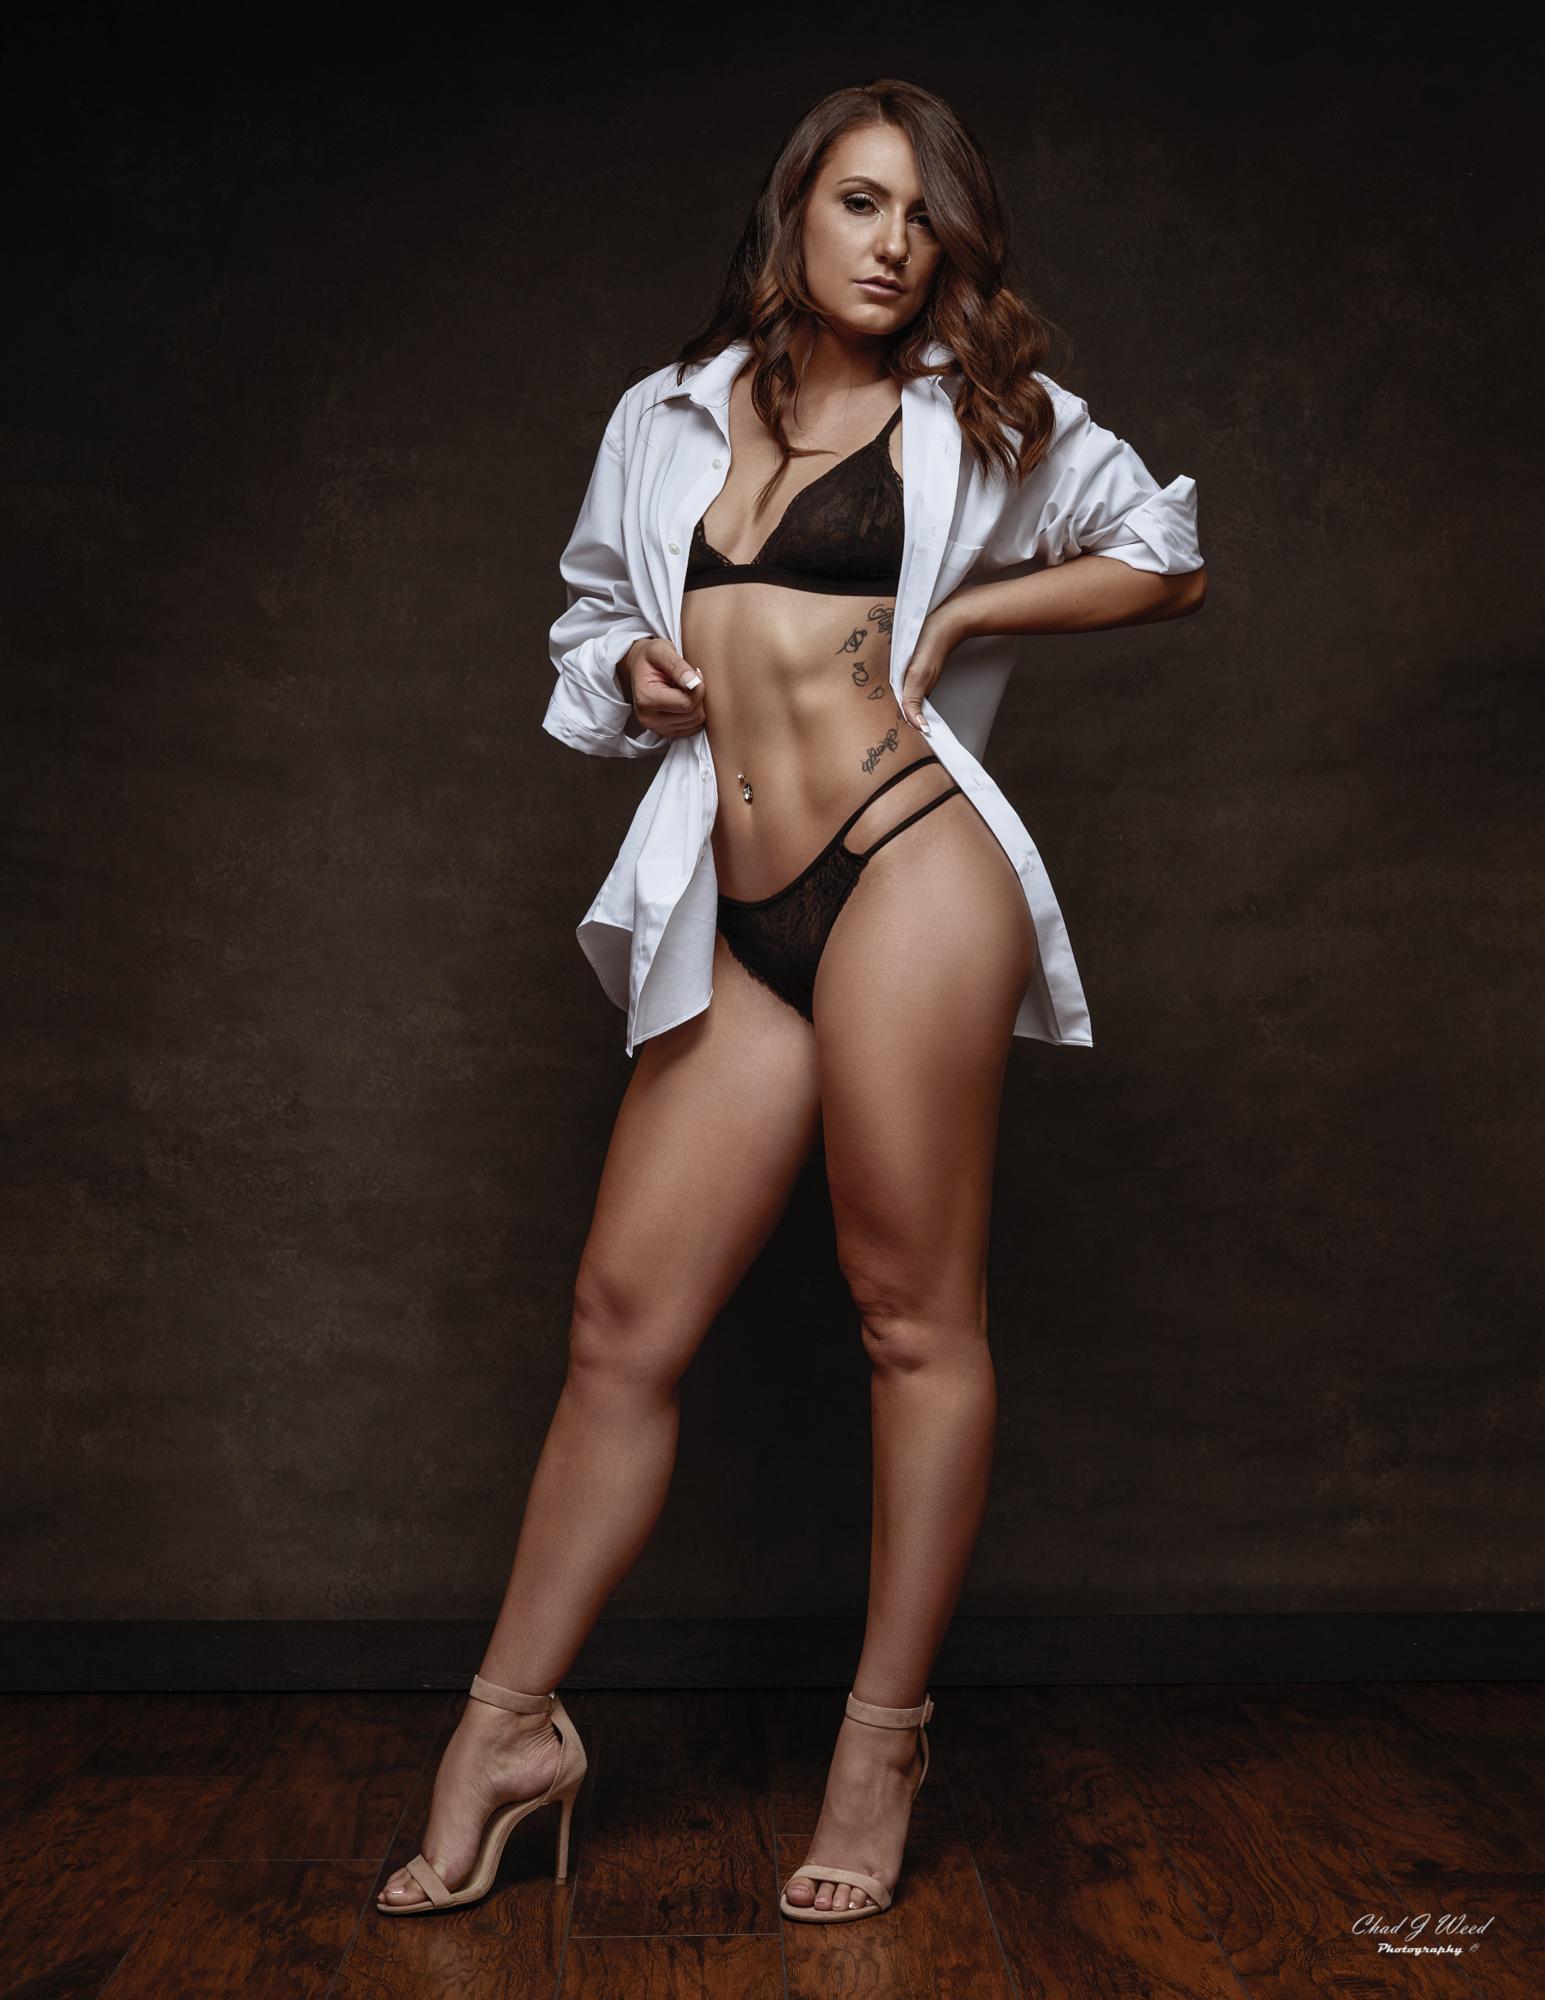 Phoenix Fitness Model Miranda by Mesa Phoenix Fitness Photographer Chad Weed